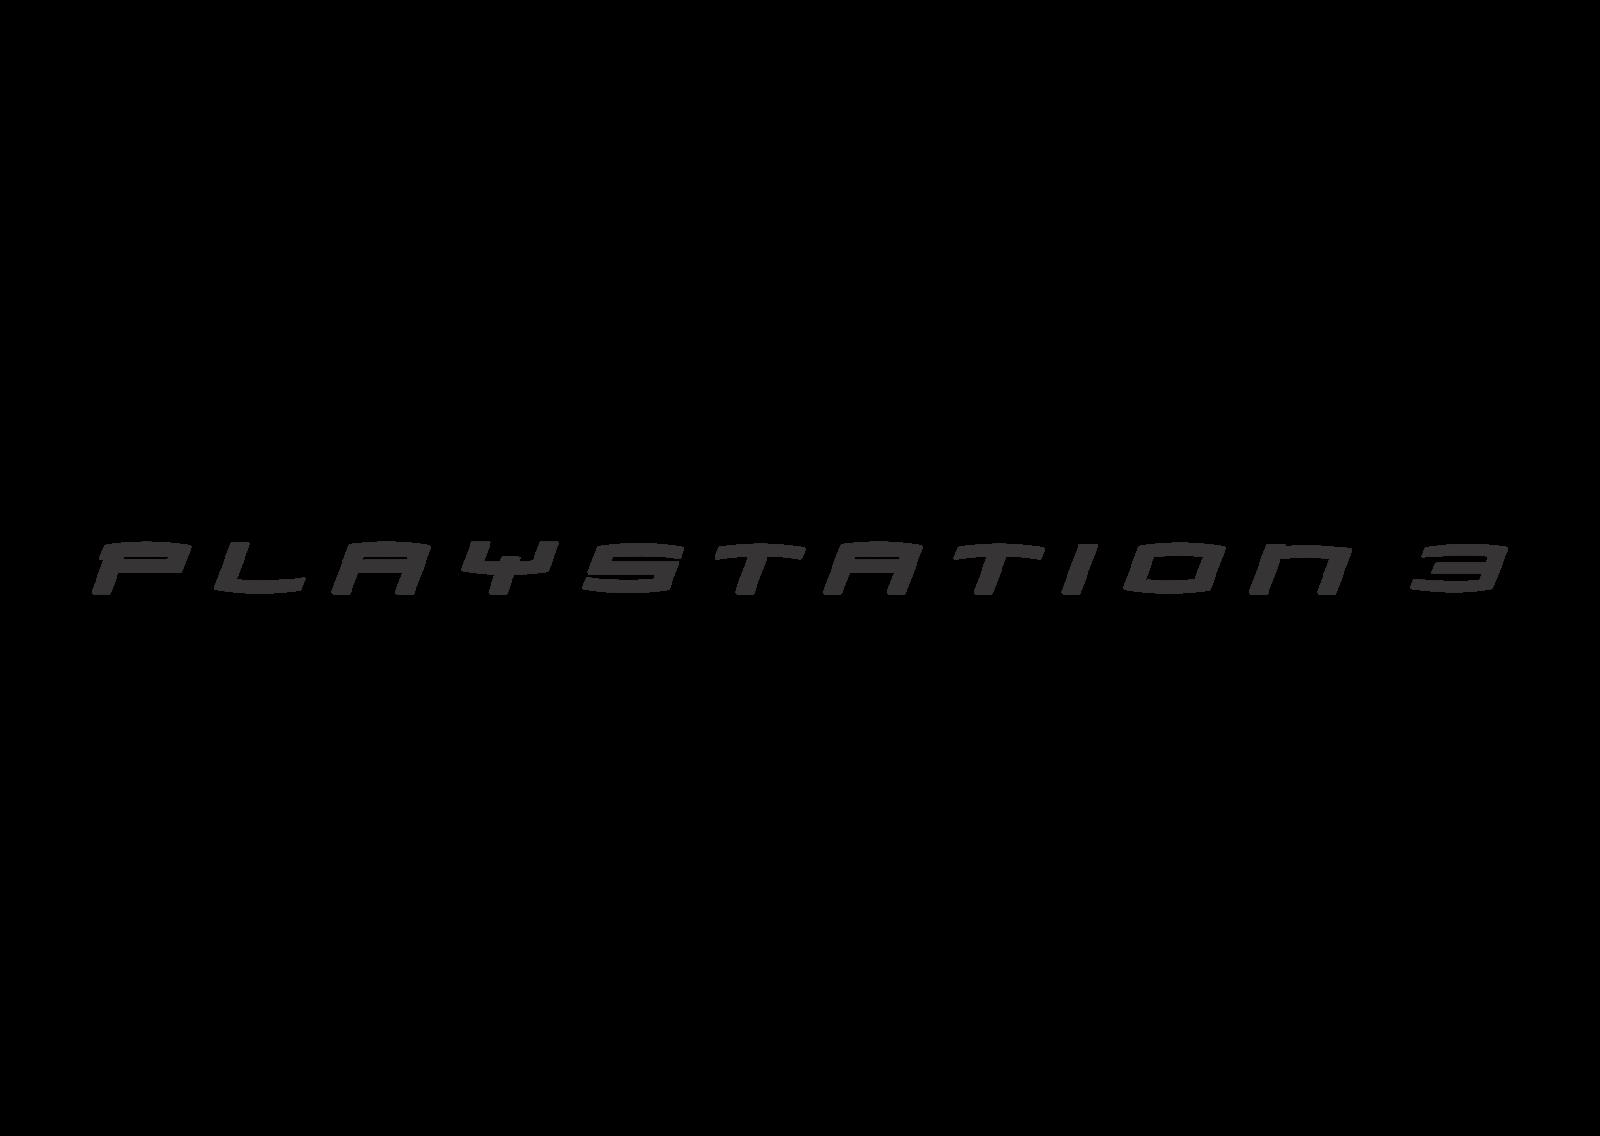 Sony playstation 3 Logo Vector ~ Format Cdr, Ai, Eps, Svg ...